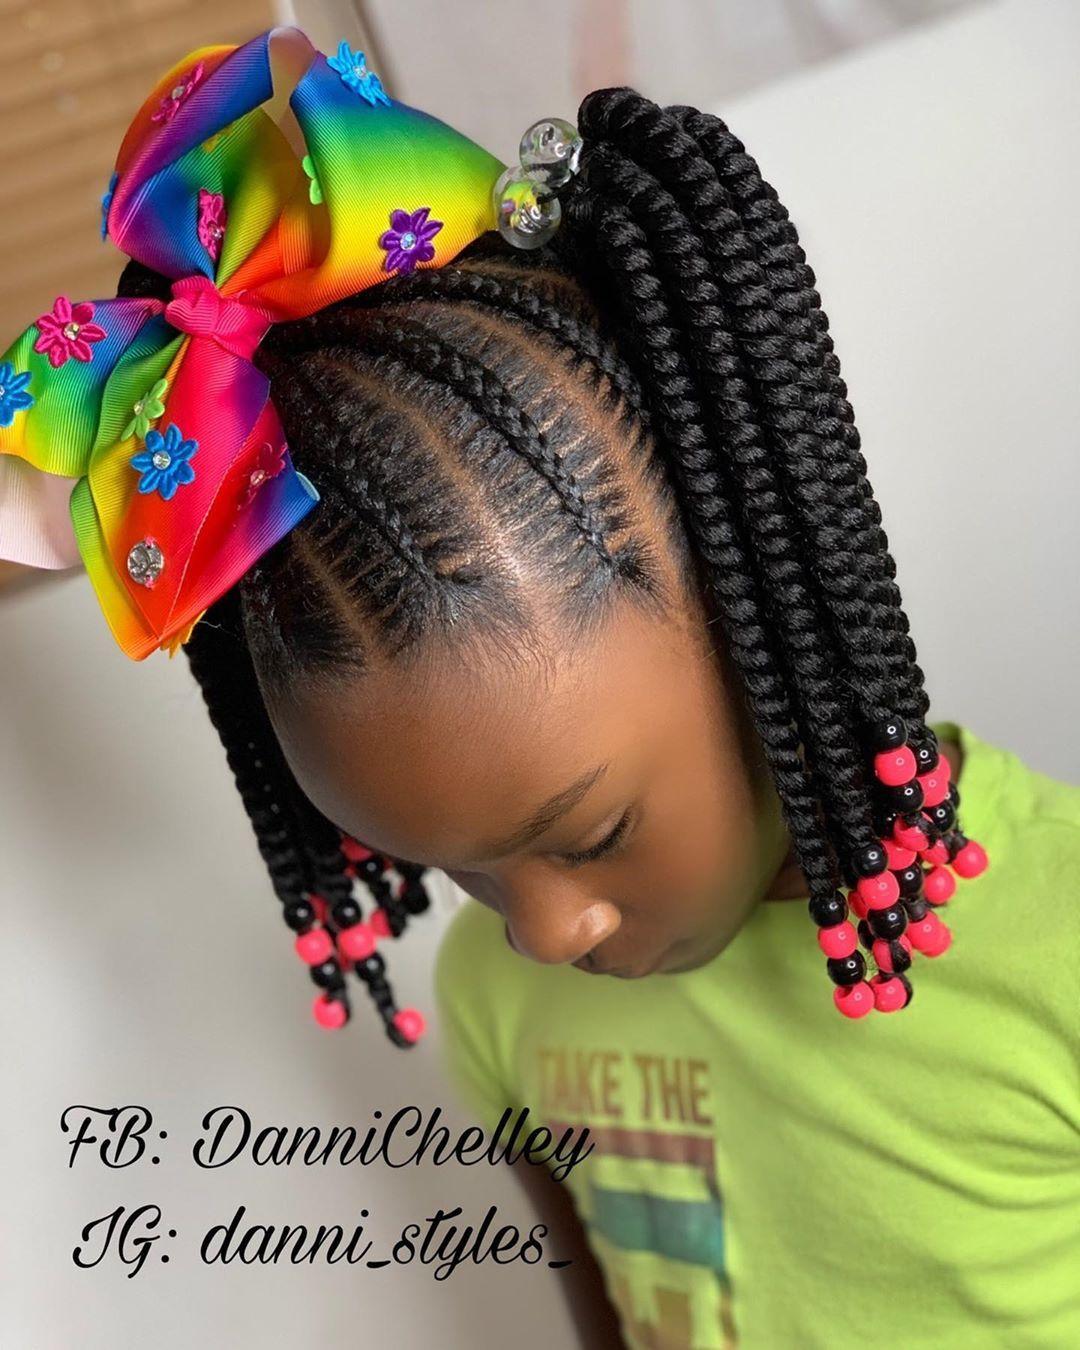 L Image Peut Contenir Une Ou Plusieurs Personnes Et Gros Plan Kids Hairstyles Hair Styles Twist Hairstyle Kids